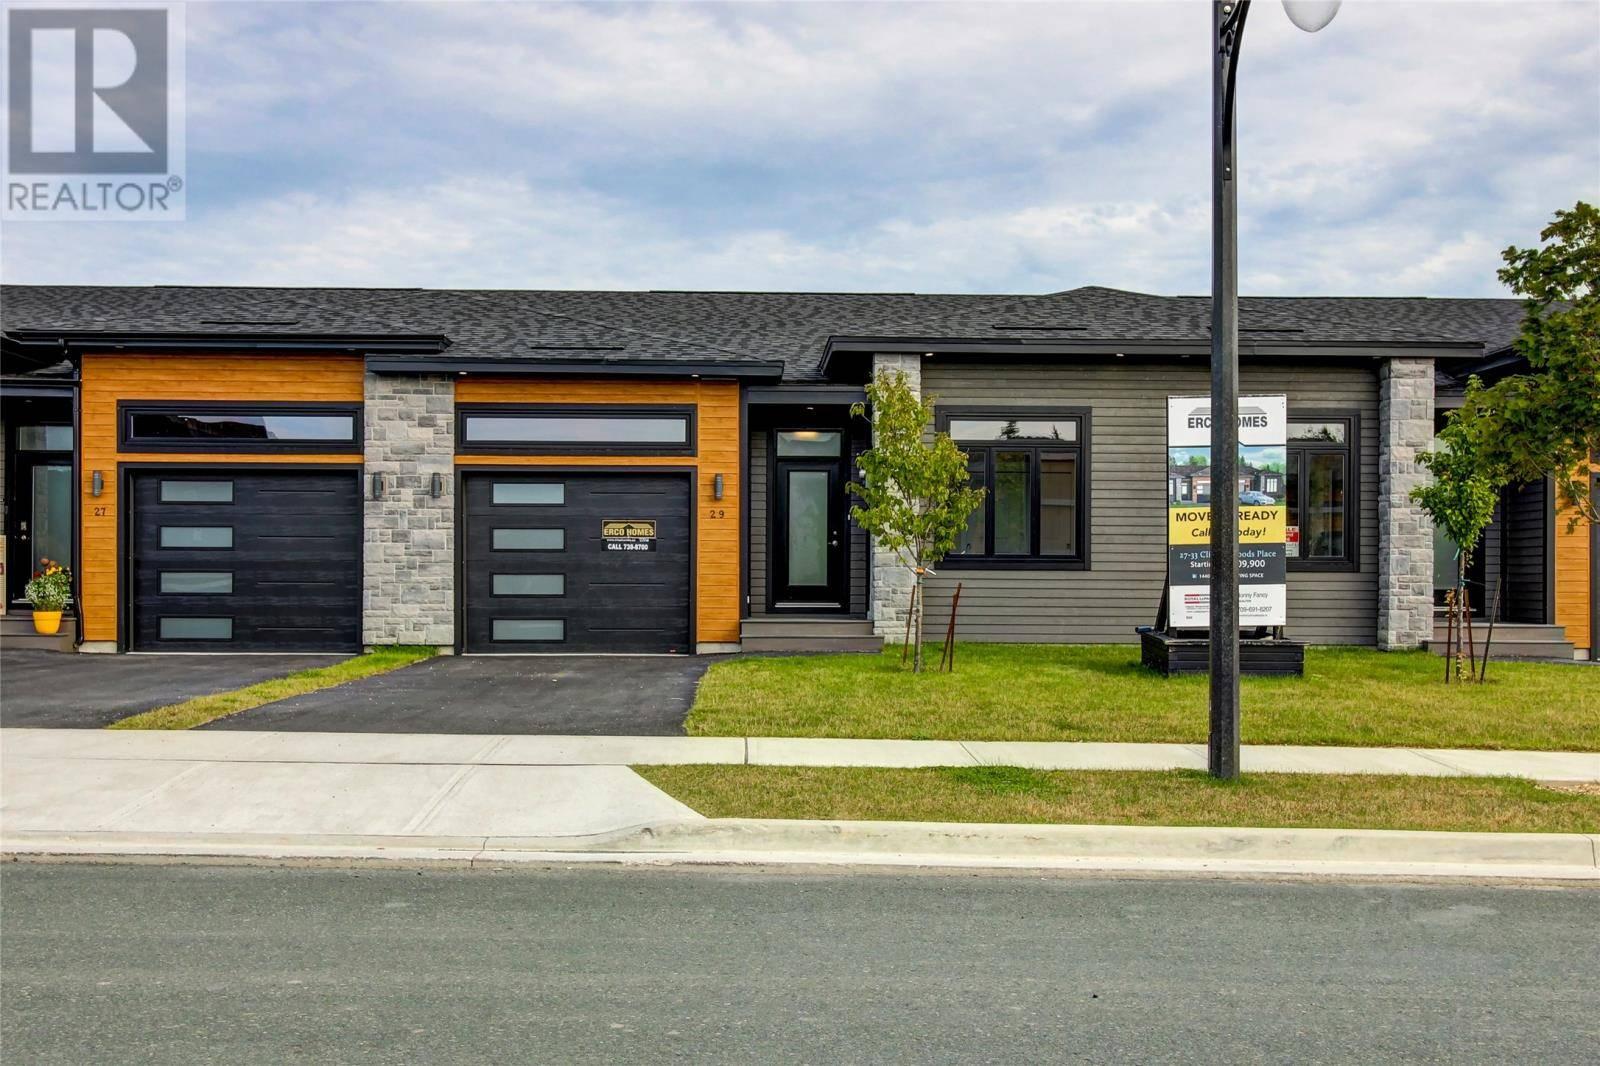 House for sale at 29 Clifden Woods Pl St. John's Newfoundland - MLS: 1197032